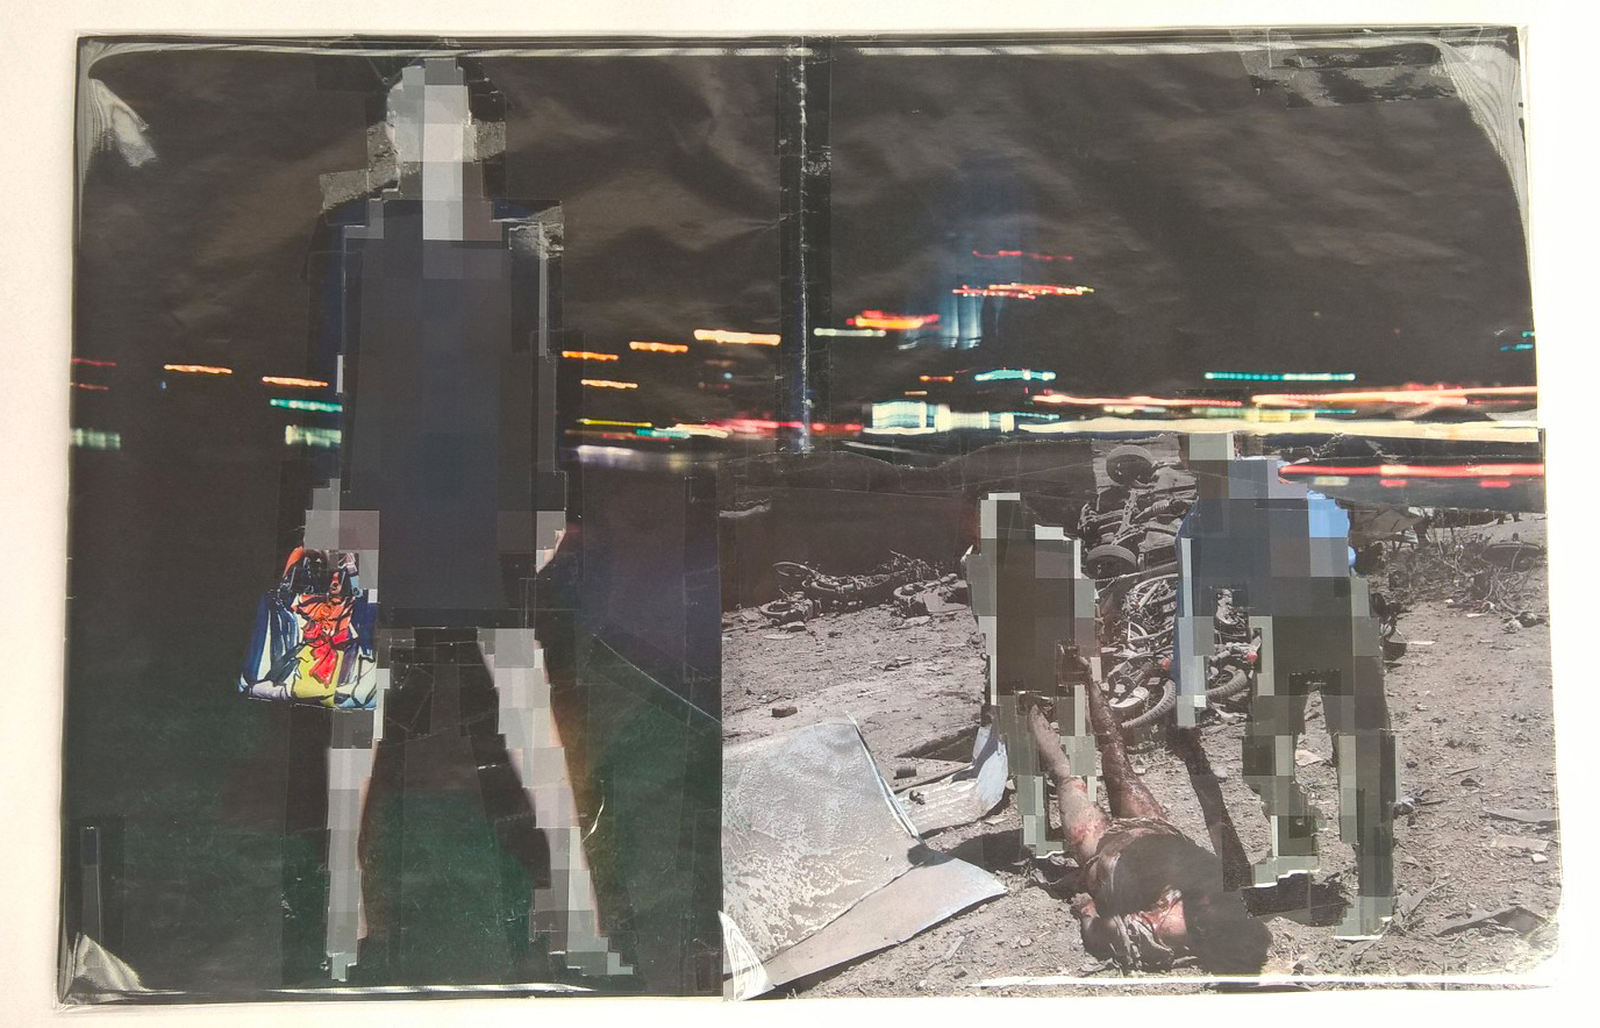 Pixel-Collage nº58, 2016, Prints, tape, transparent sheet, 34x51 cm